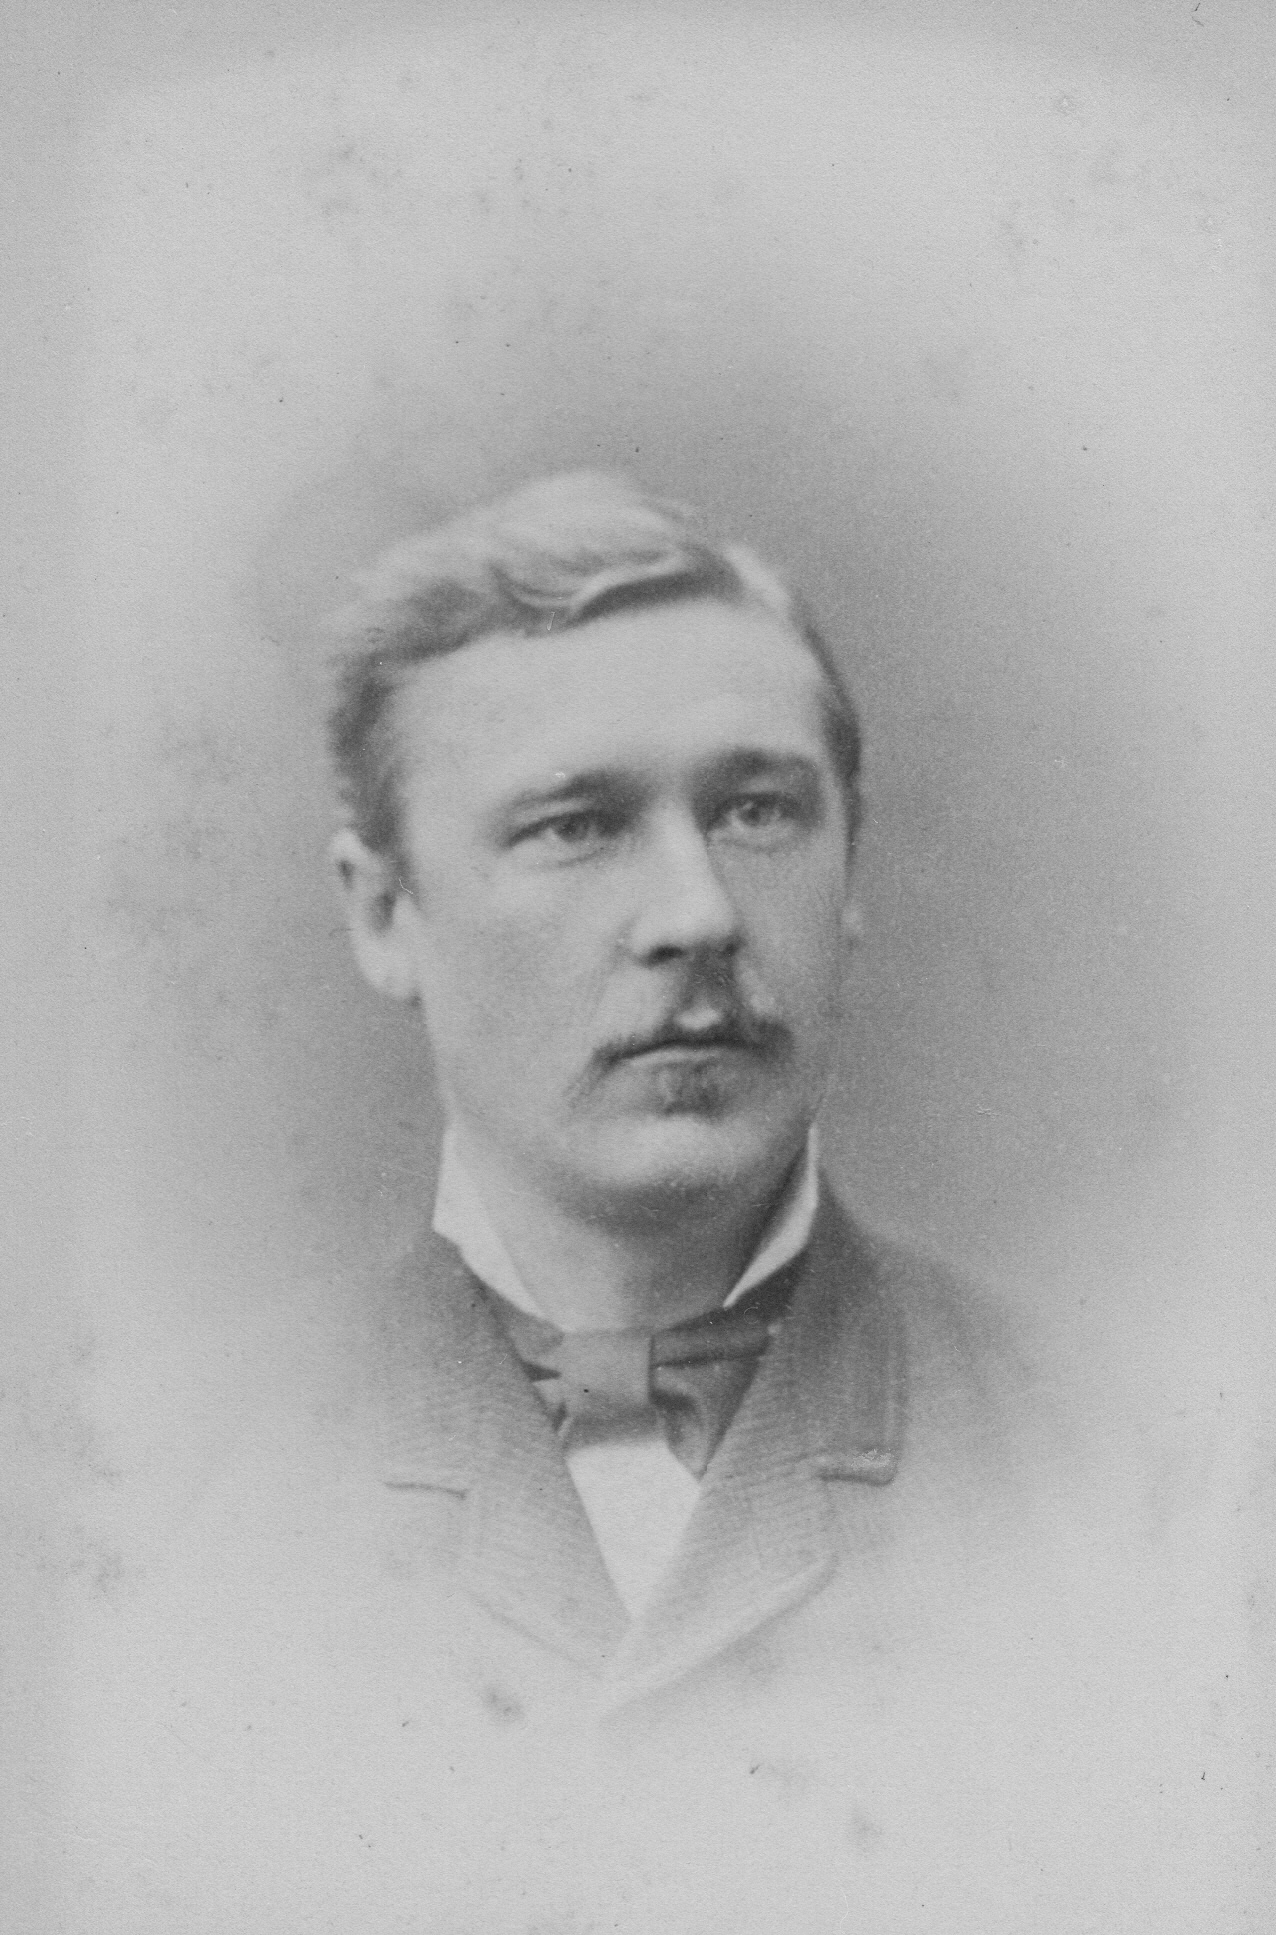 Image of Wilhelm Dreesen from Wikidata